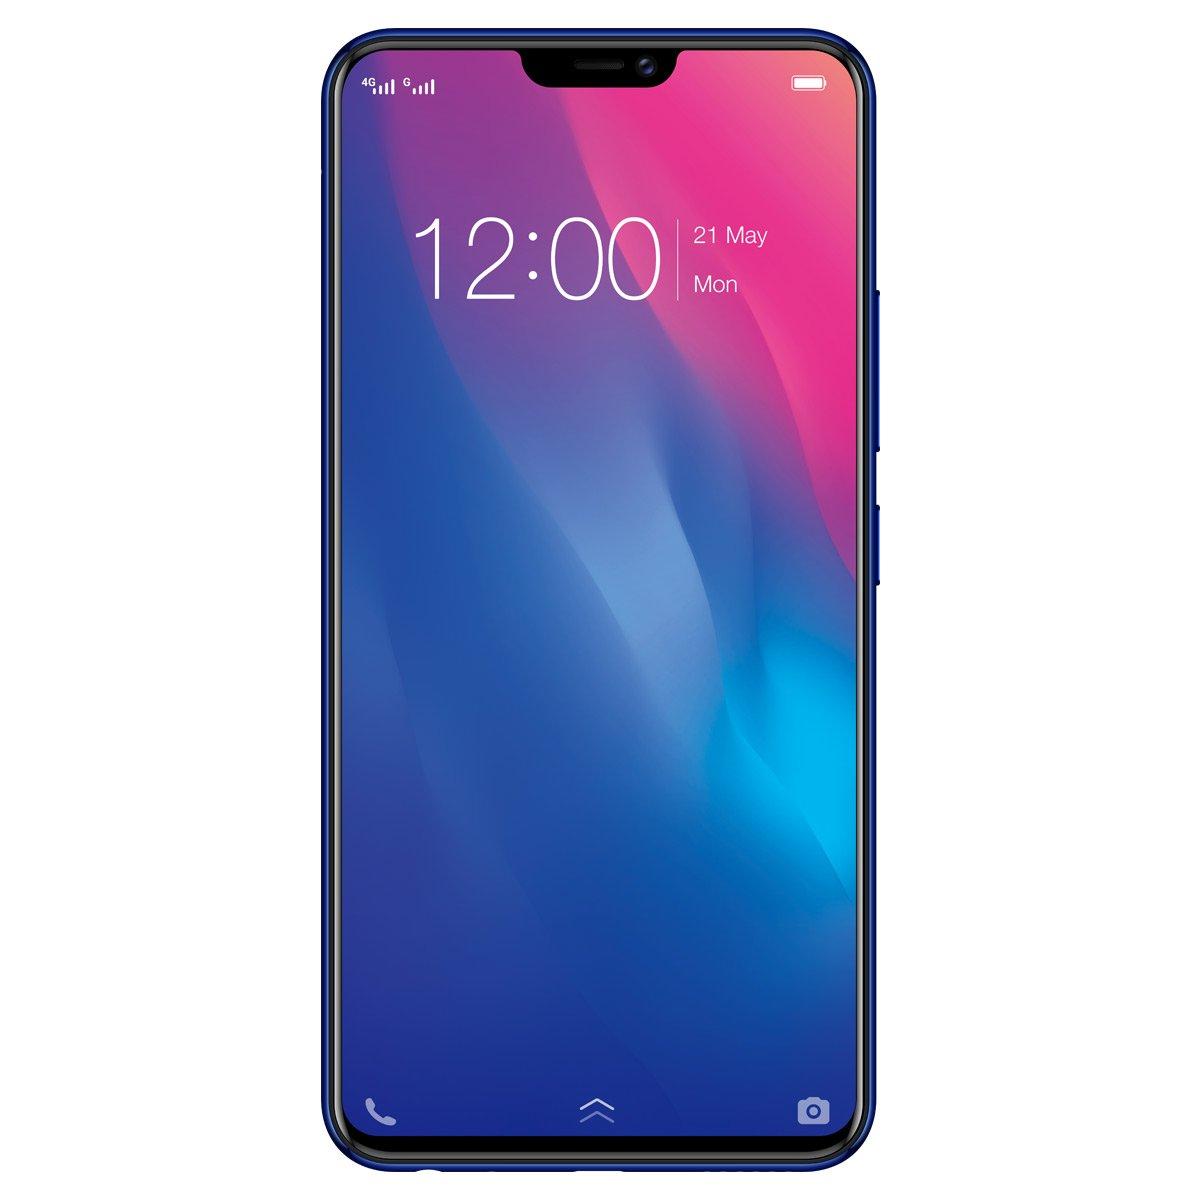 Vivo V9 (19:9 FullView Display, Sapphire Blue)